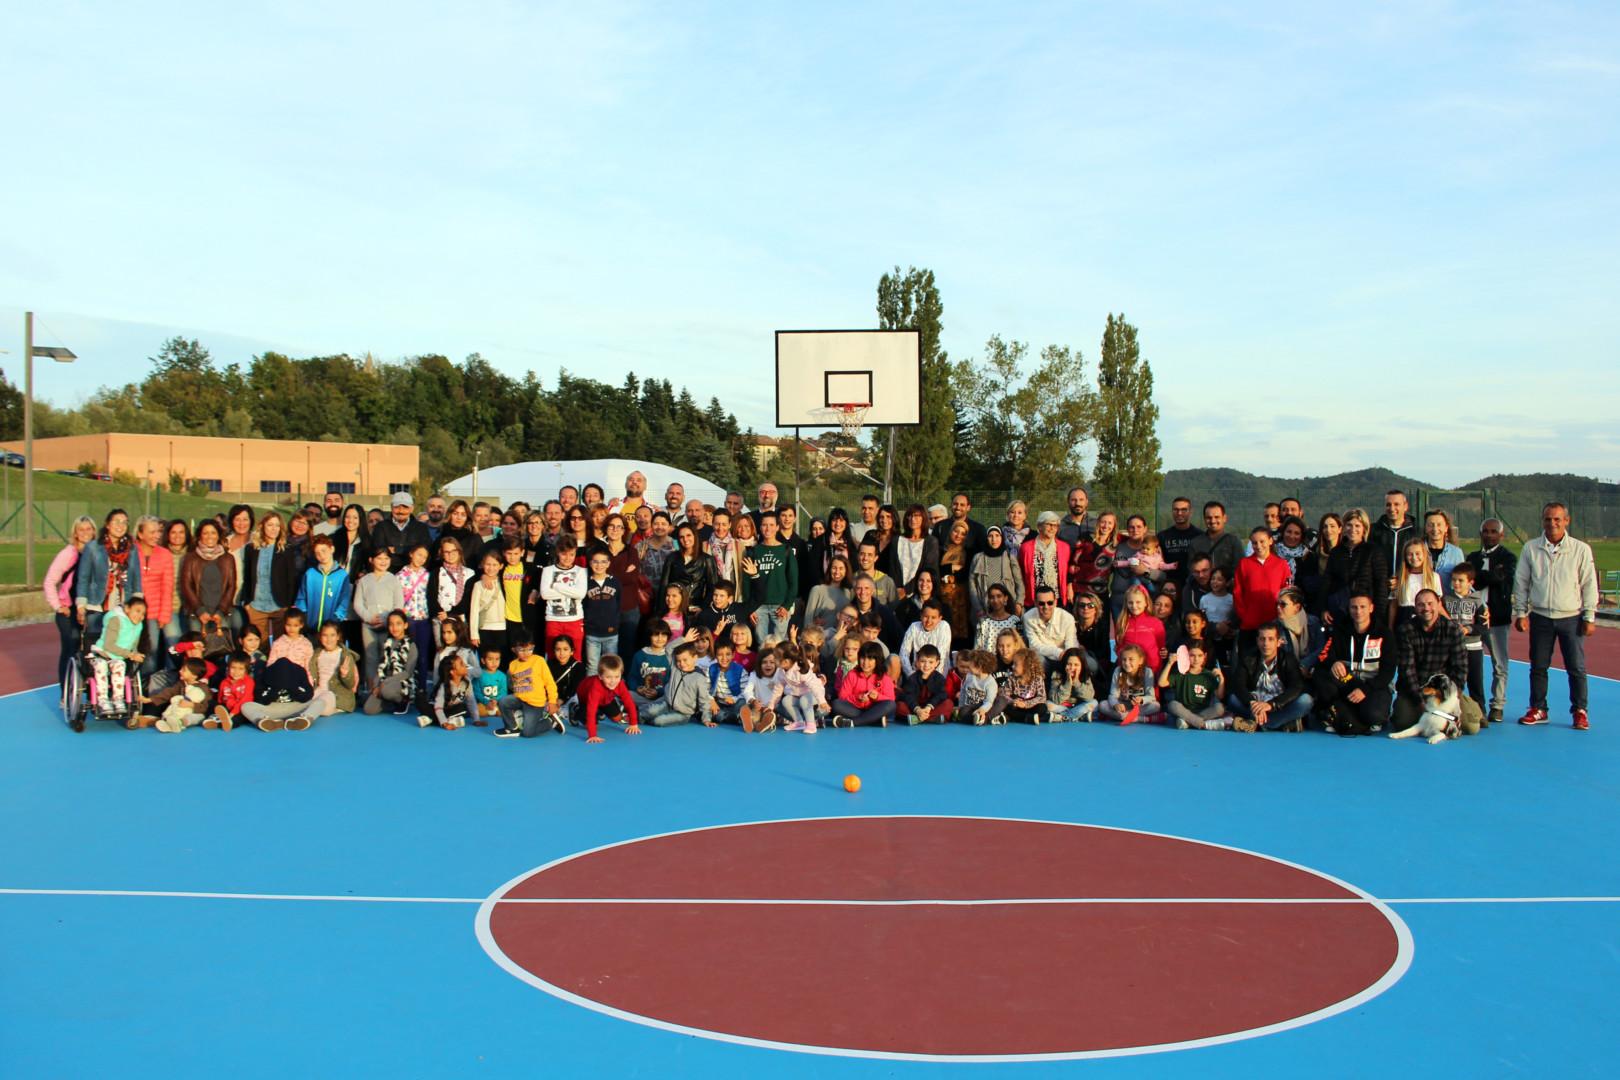 Diabete Romagna, Campo Famiglie Bambini Con Diabete 2019, Record Di Partecipanti